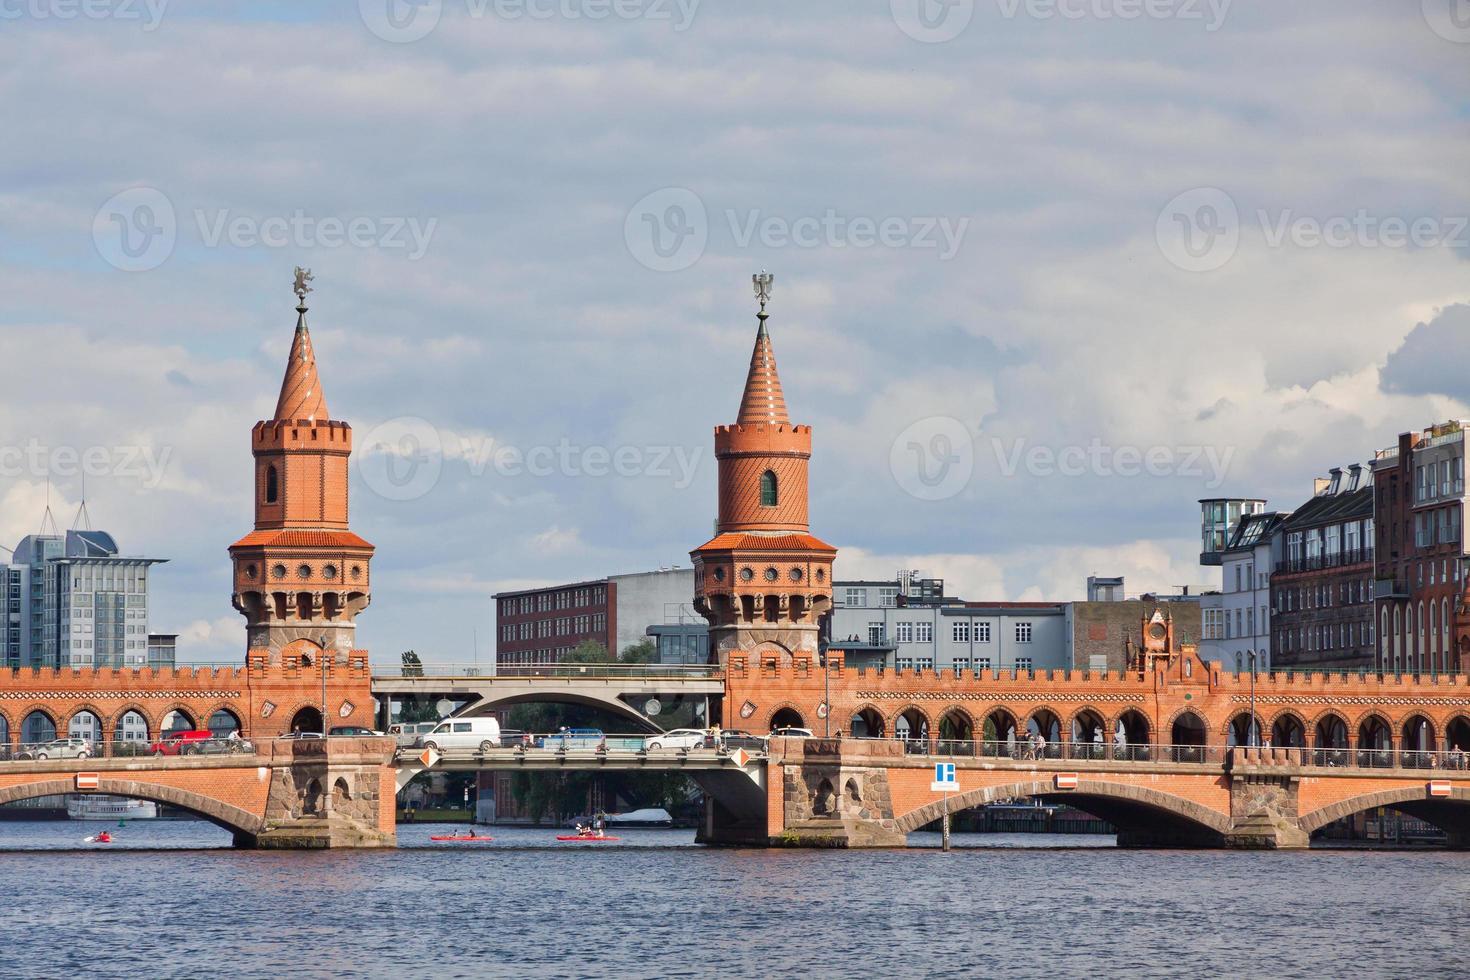 Pont oberbaumbrucke sur la rivière Spree à berlin photo